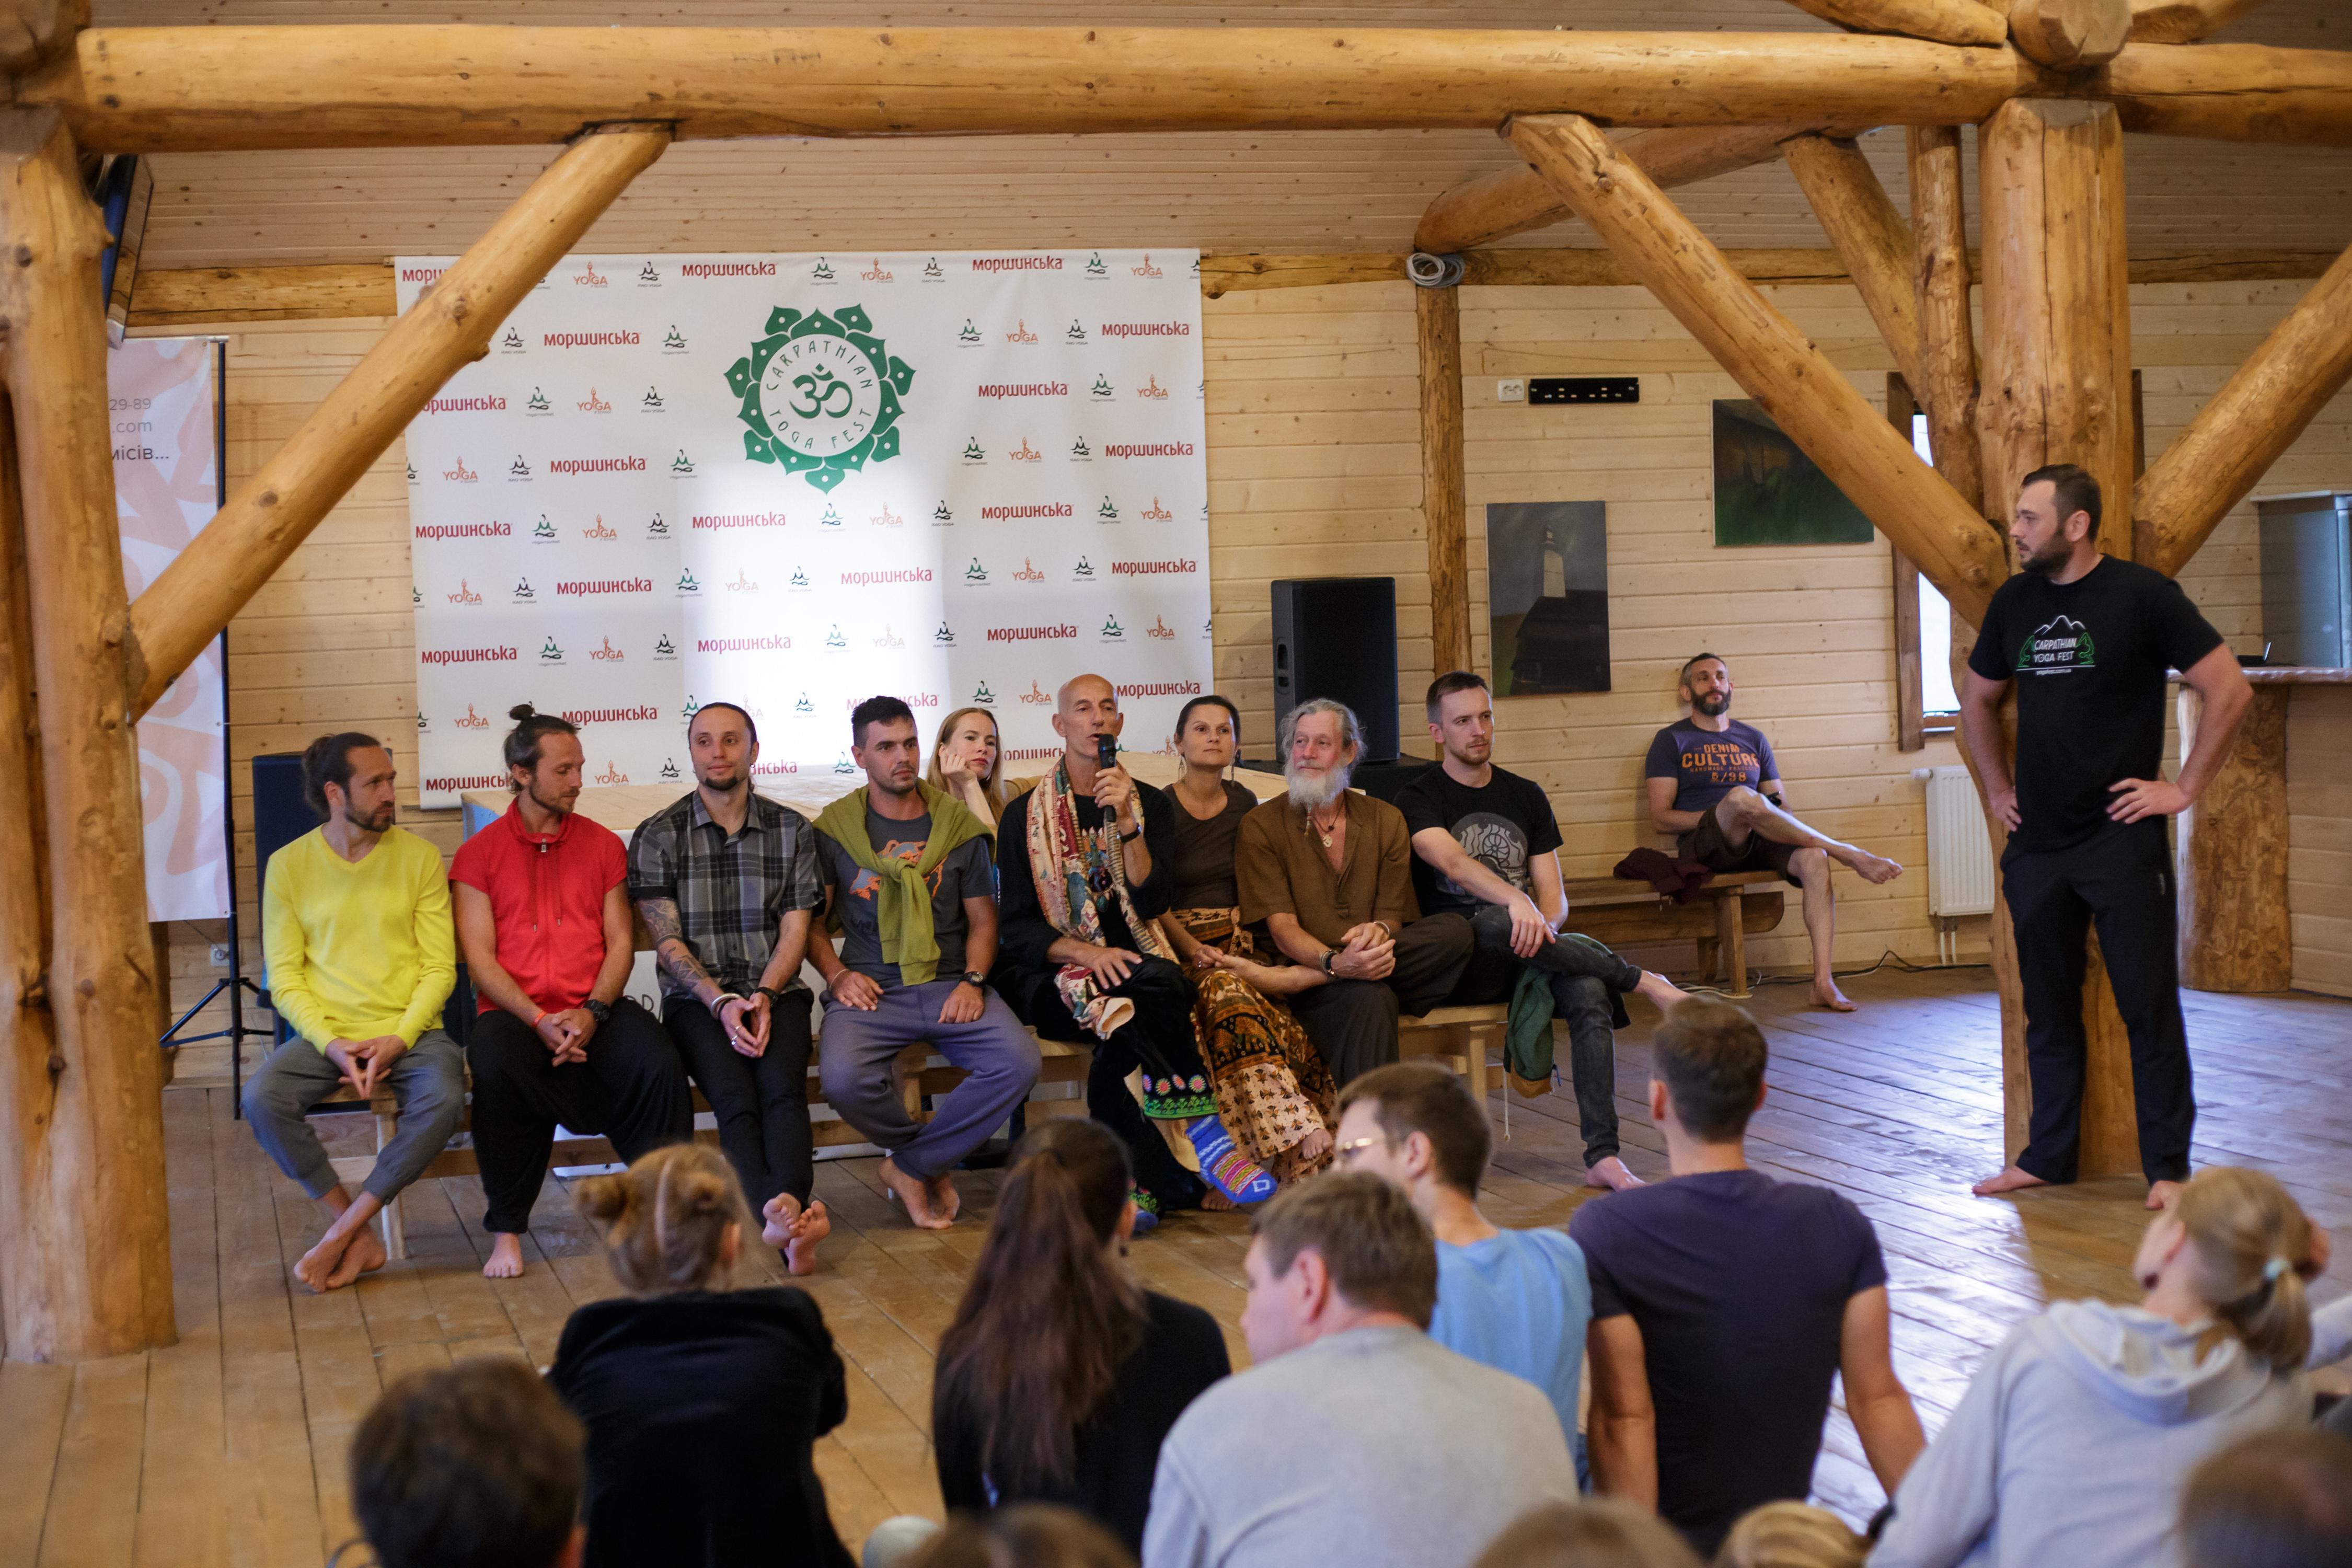 yoga teachers talk